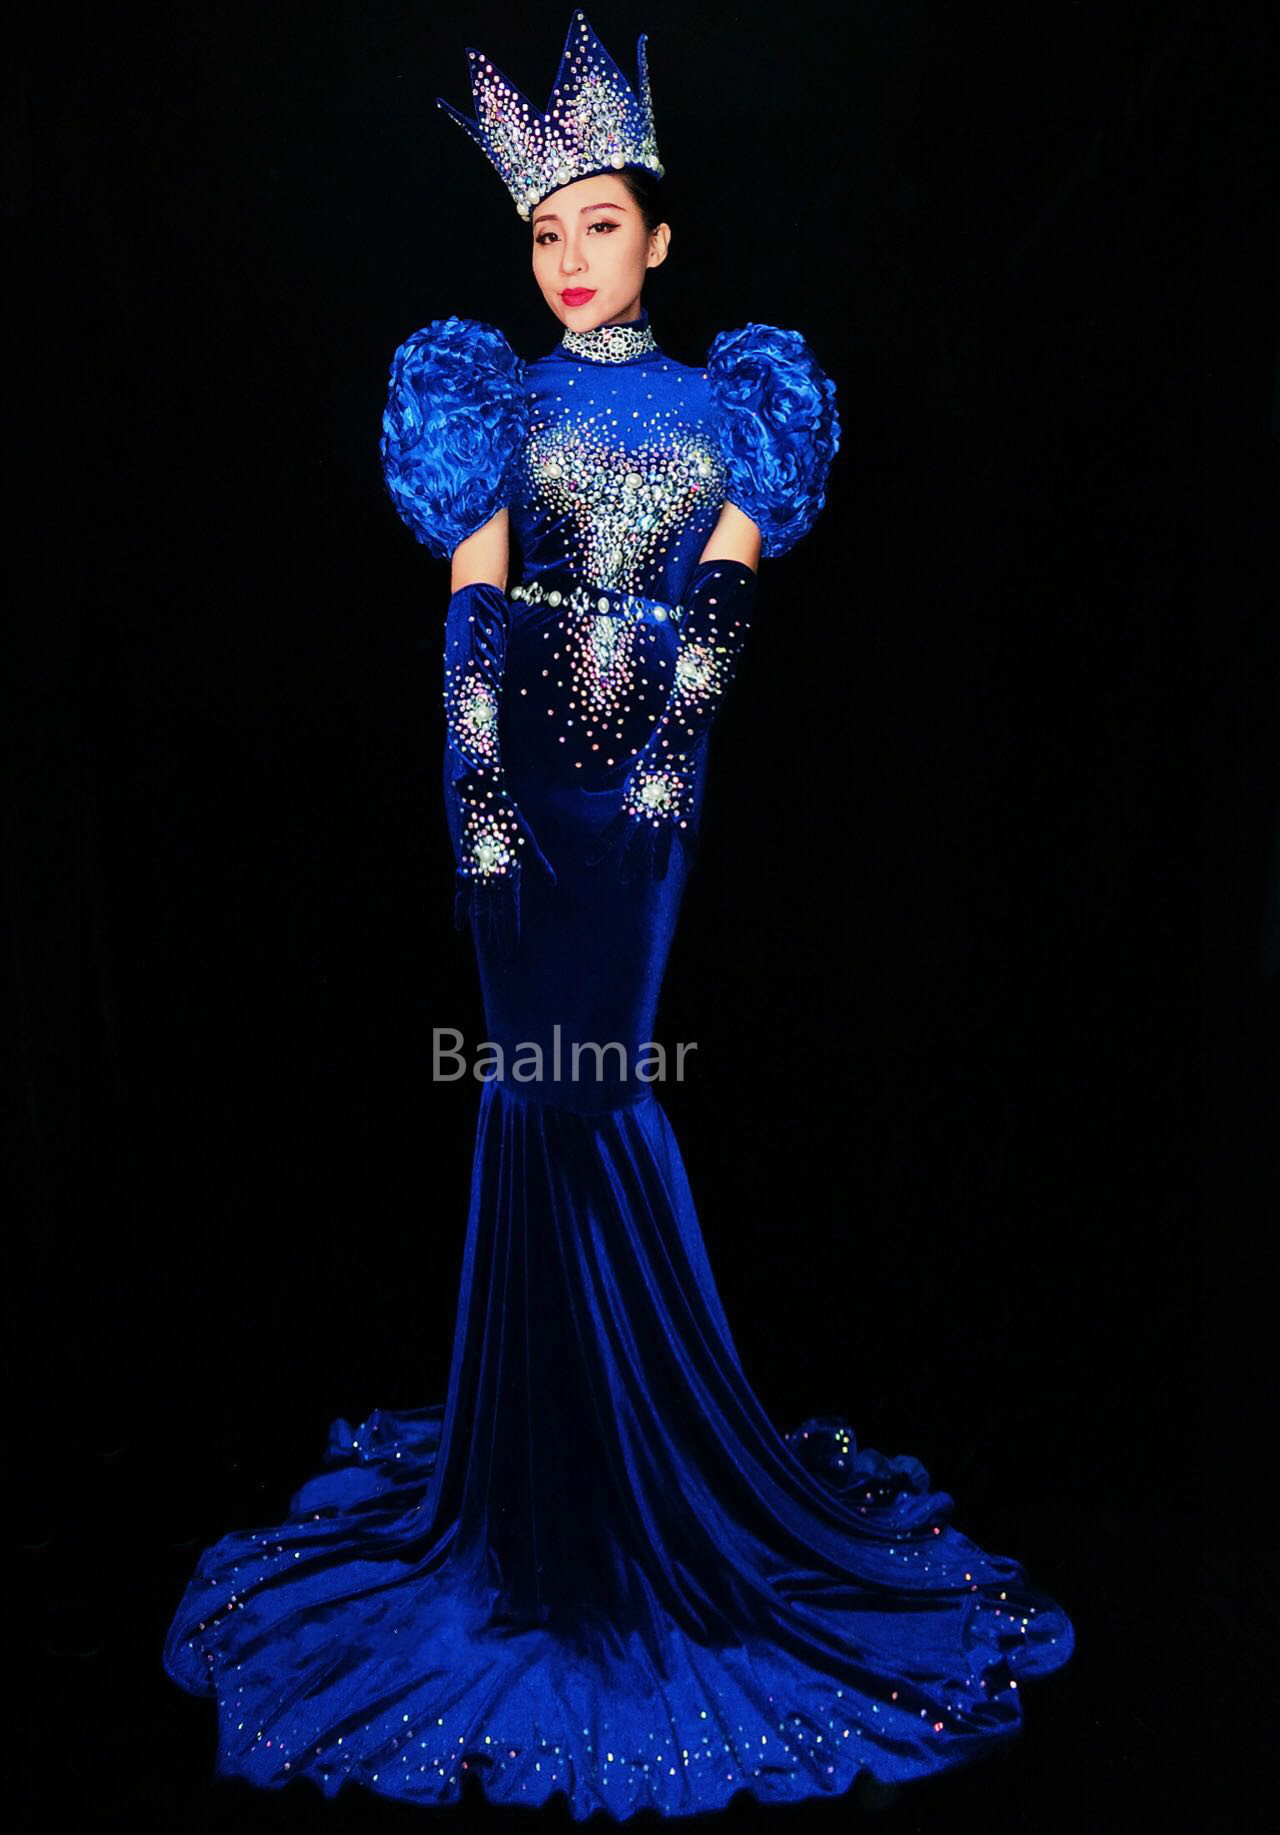 Sparkly Rhinestones Blue Long Dress Glisten Full Stones Big Floor Tail Dress Nightclub Costume Prom Birthday Celebrate Dresses